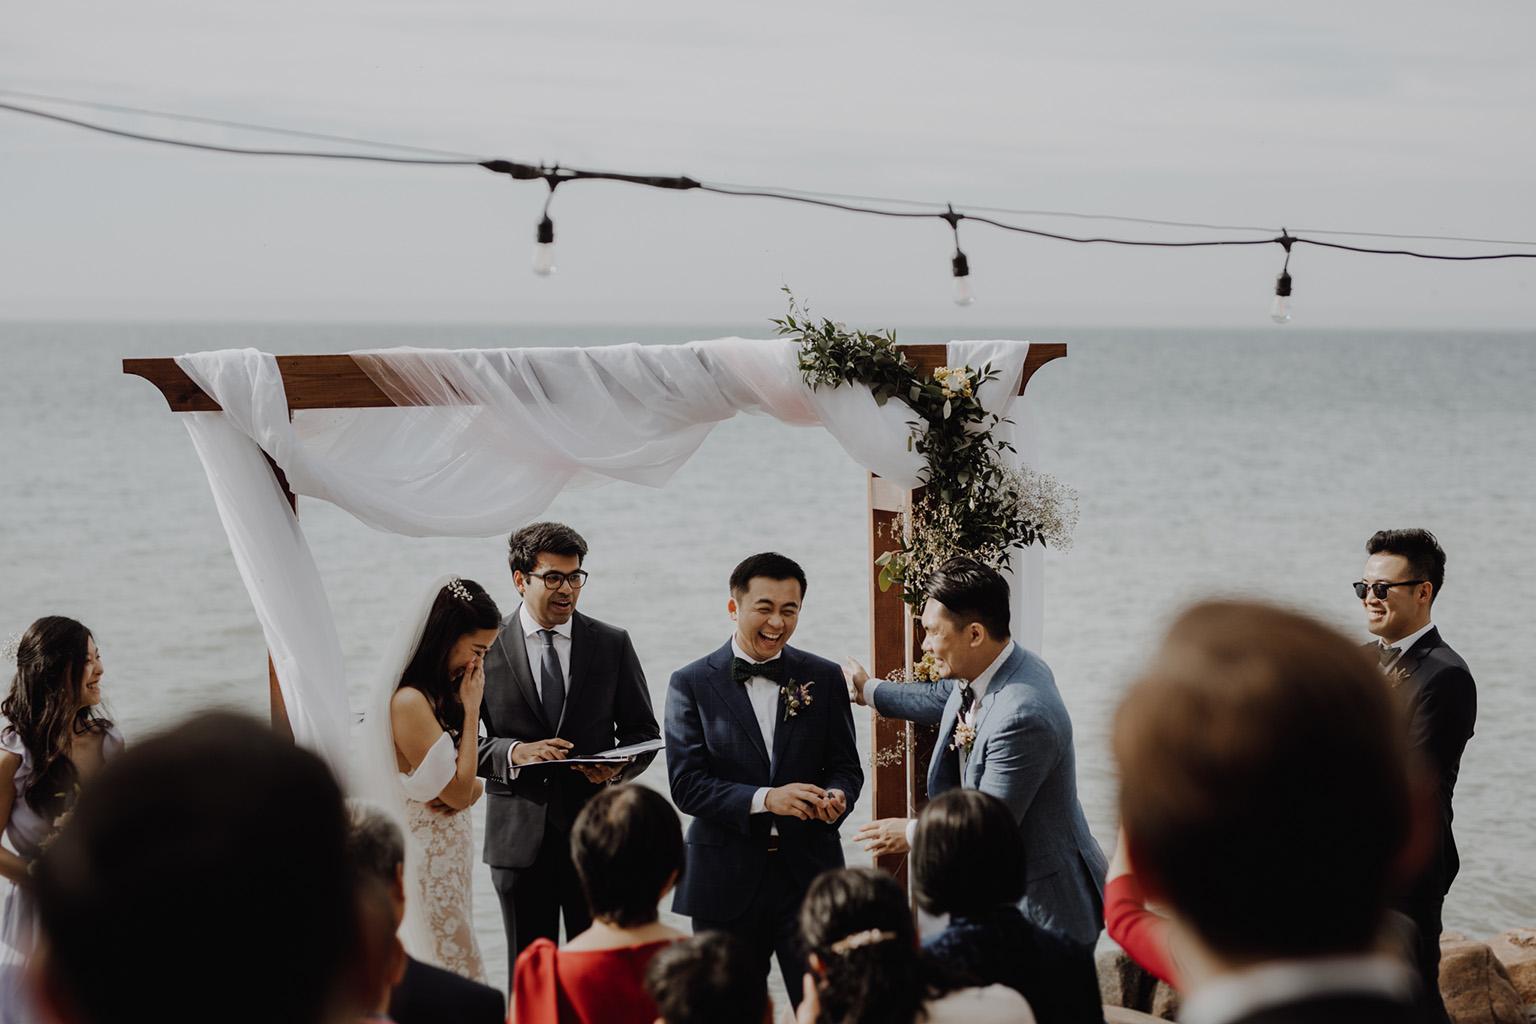 Serenity Cottage Wedding - lakeside Georgian bay nuptials